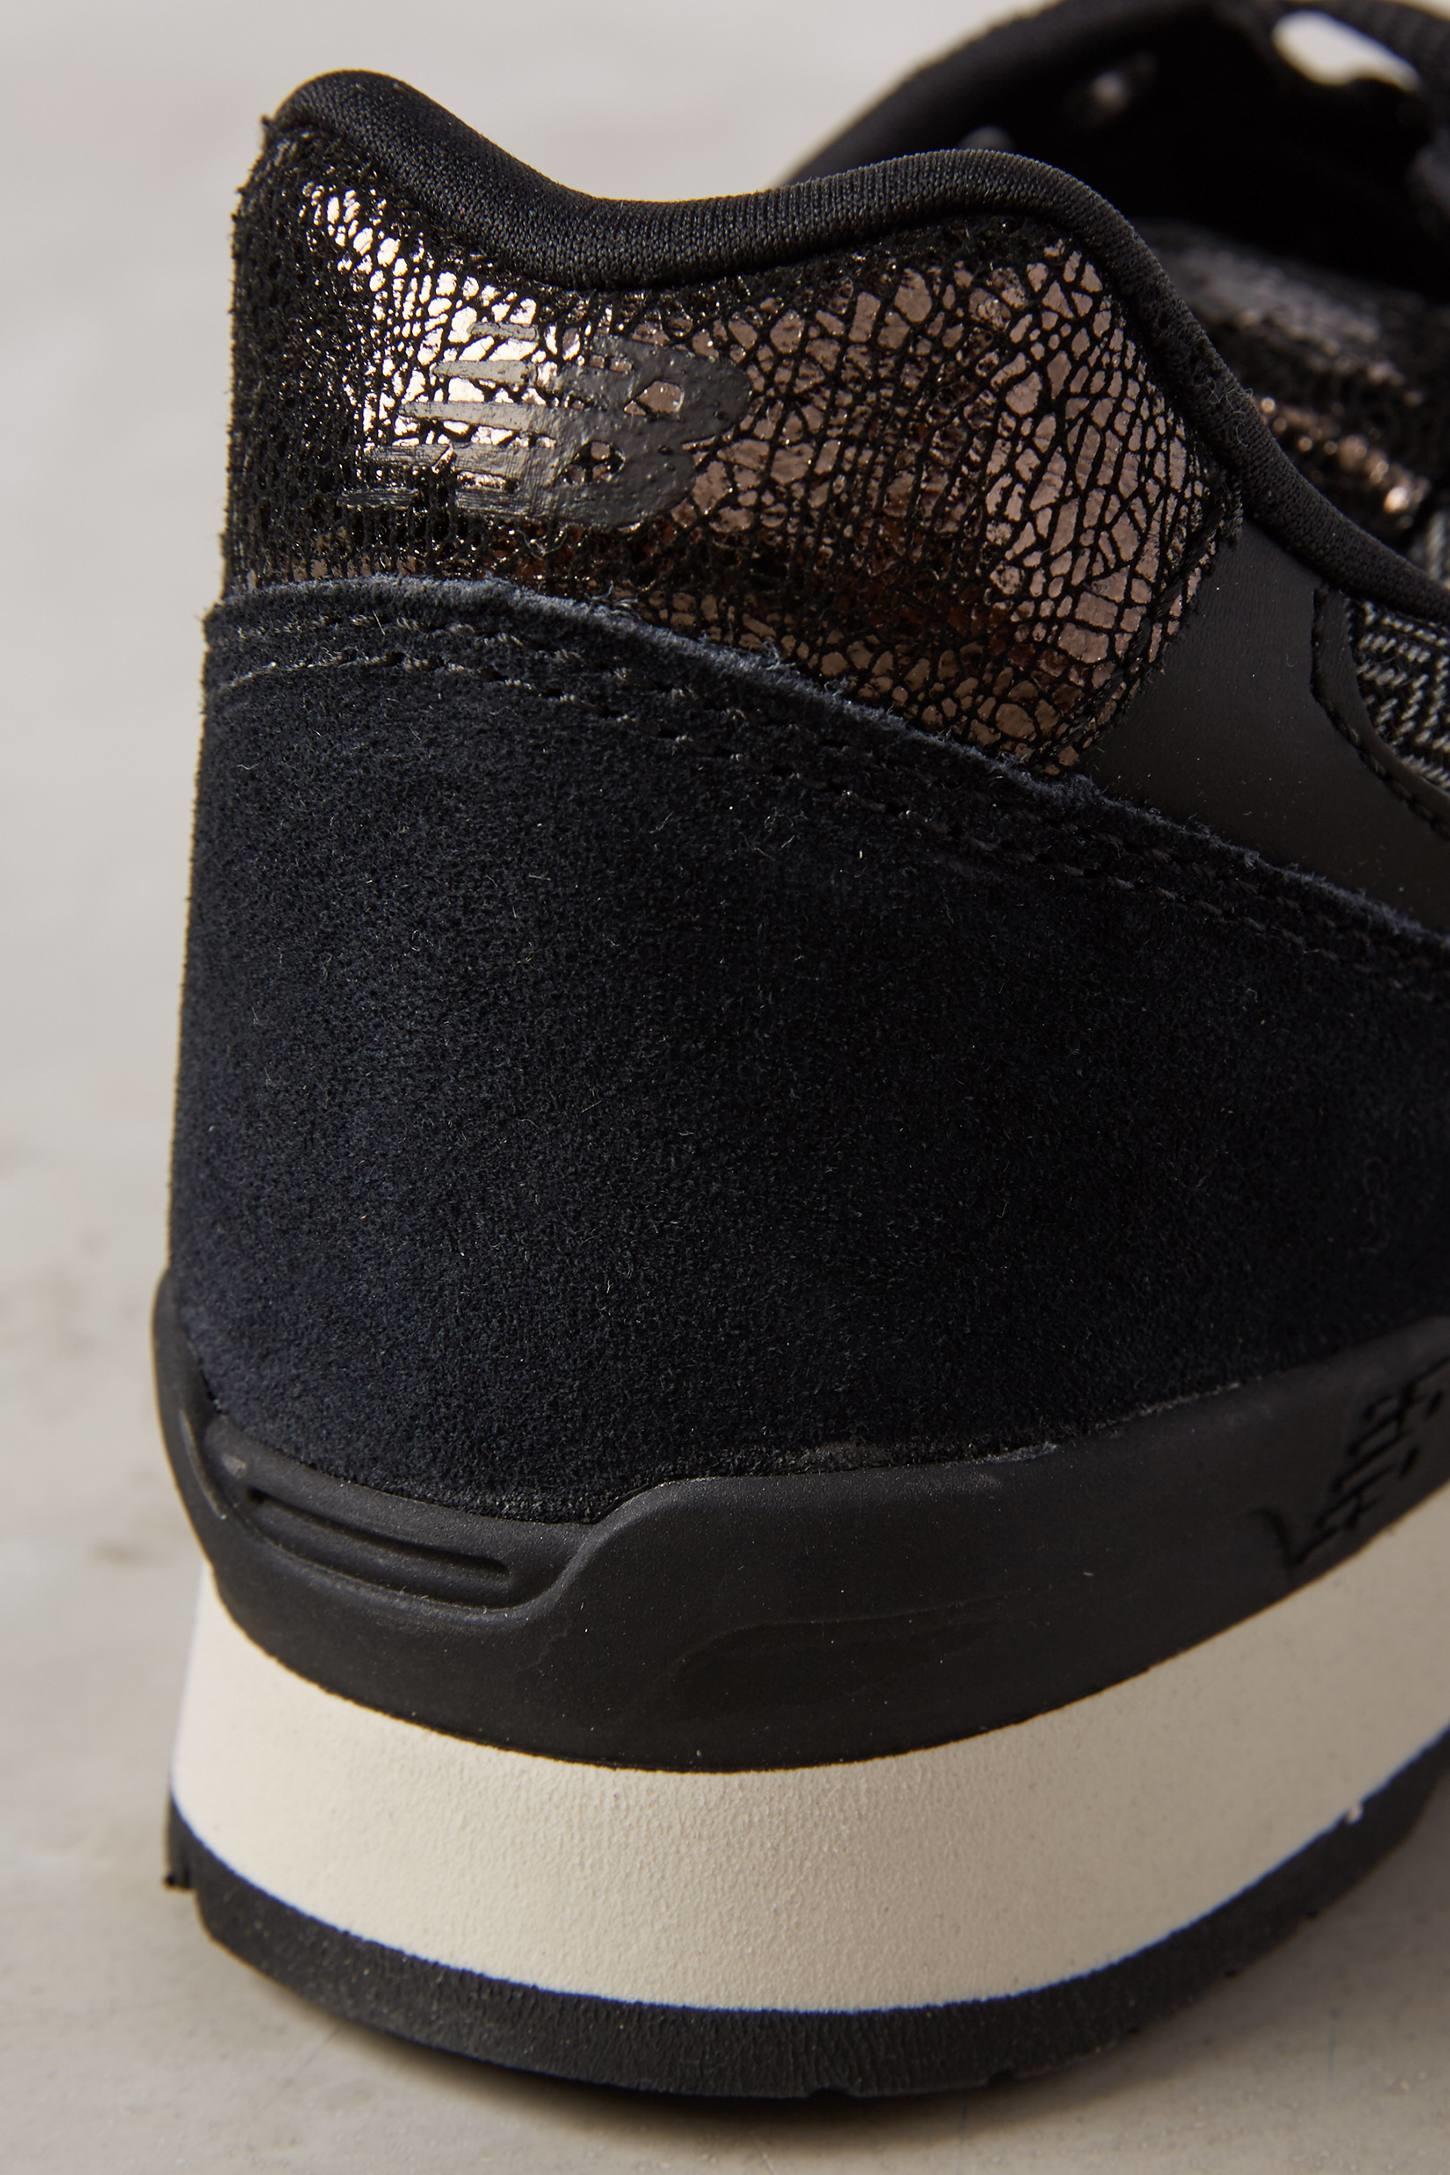 new balance capsule metallic sneakers in black lyst. Black Bedroom Furniture Sets. Home Design Ideas